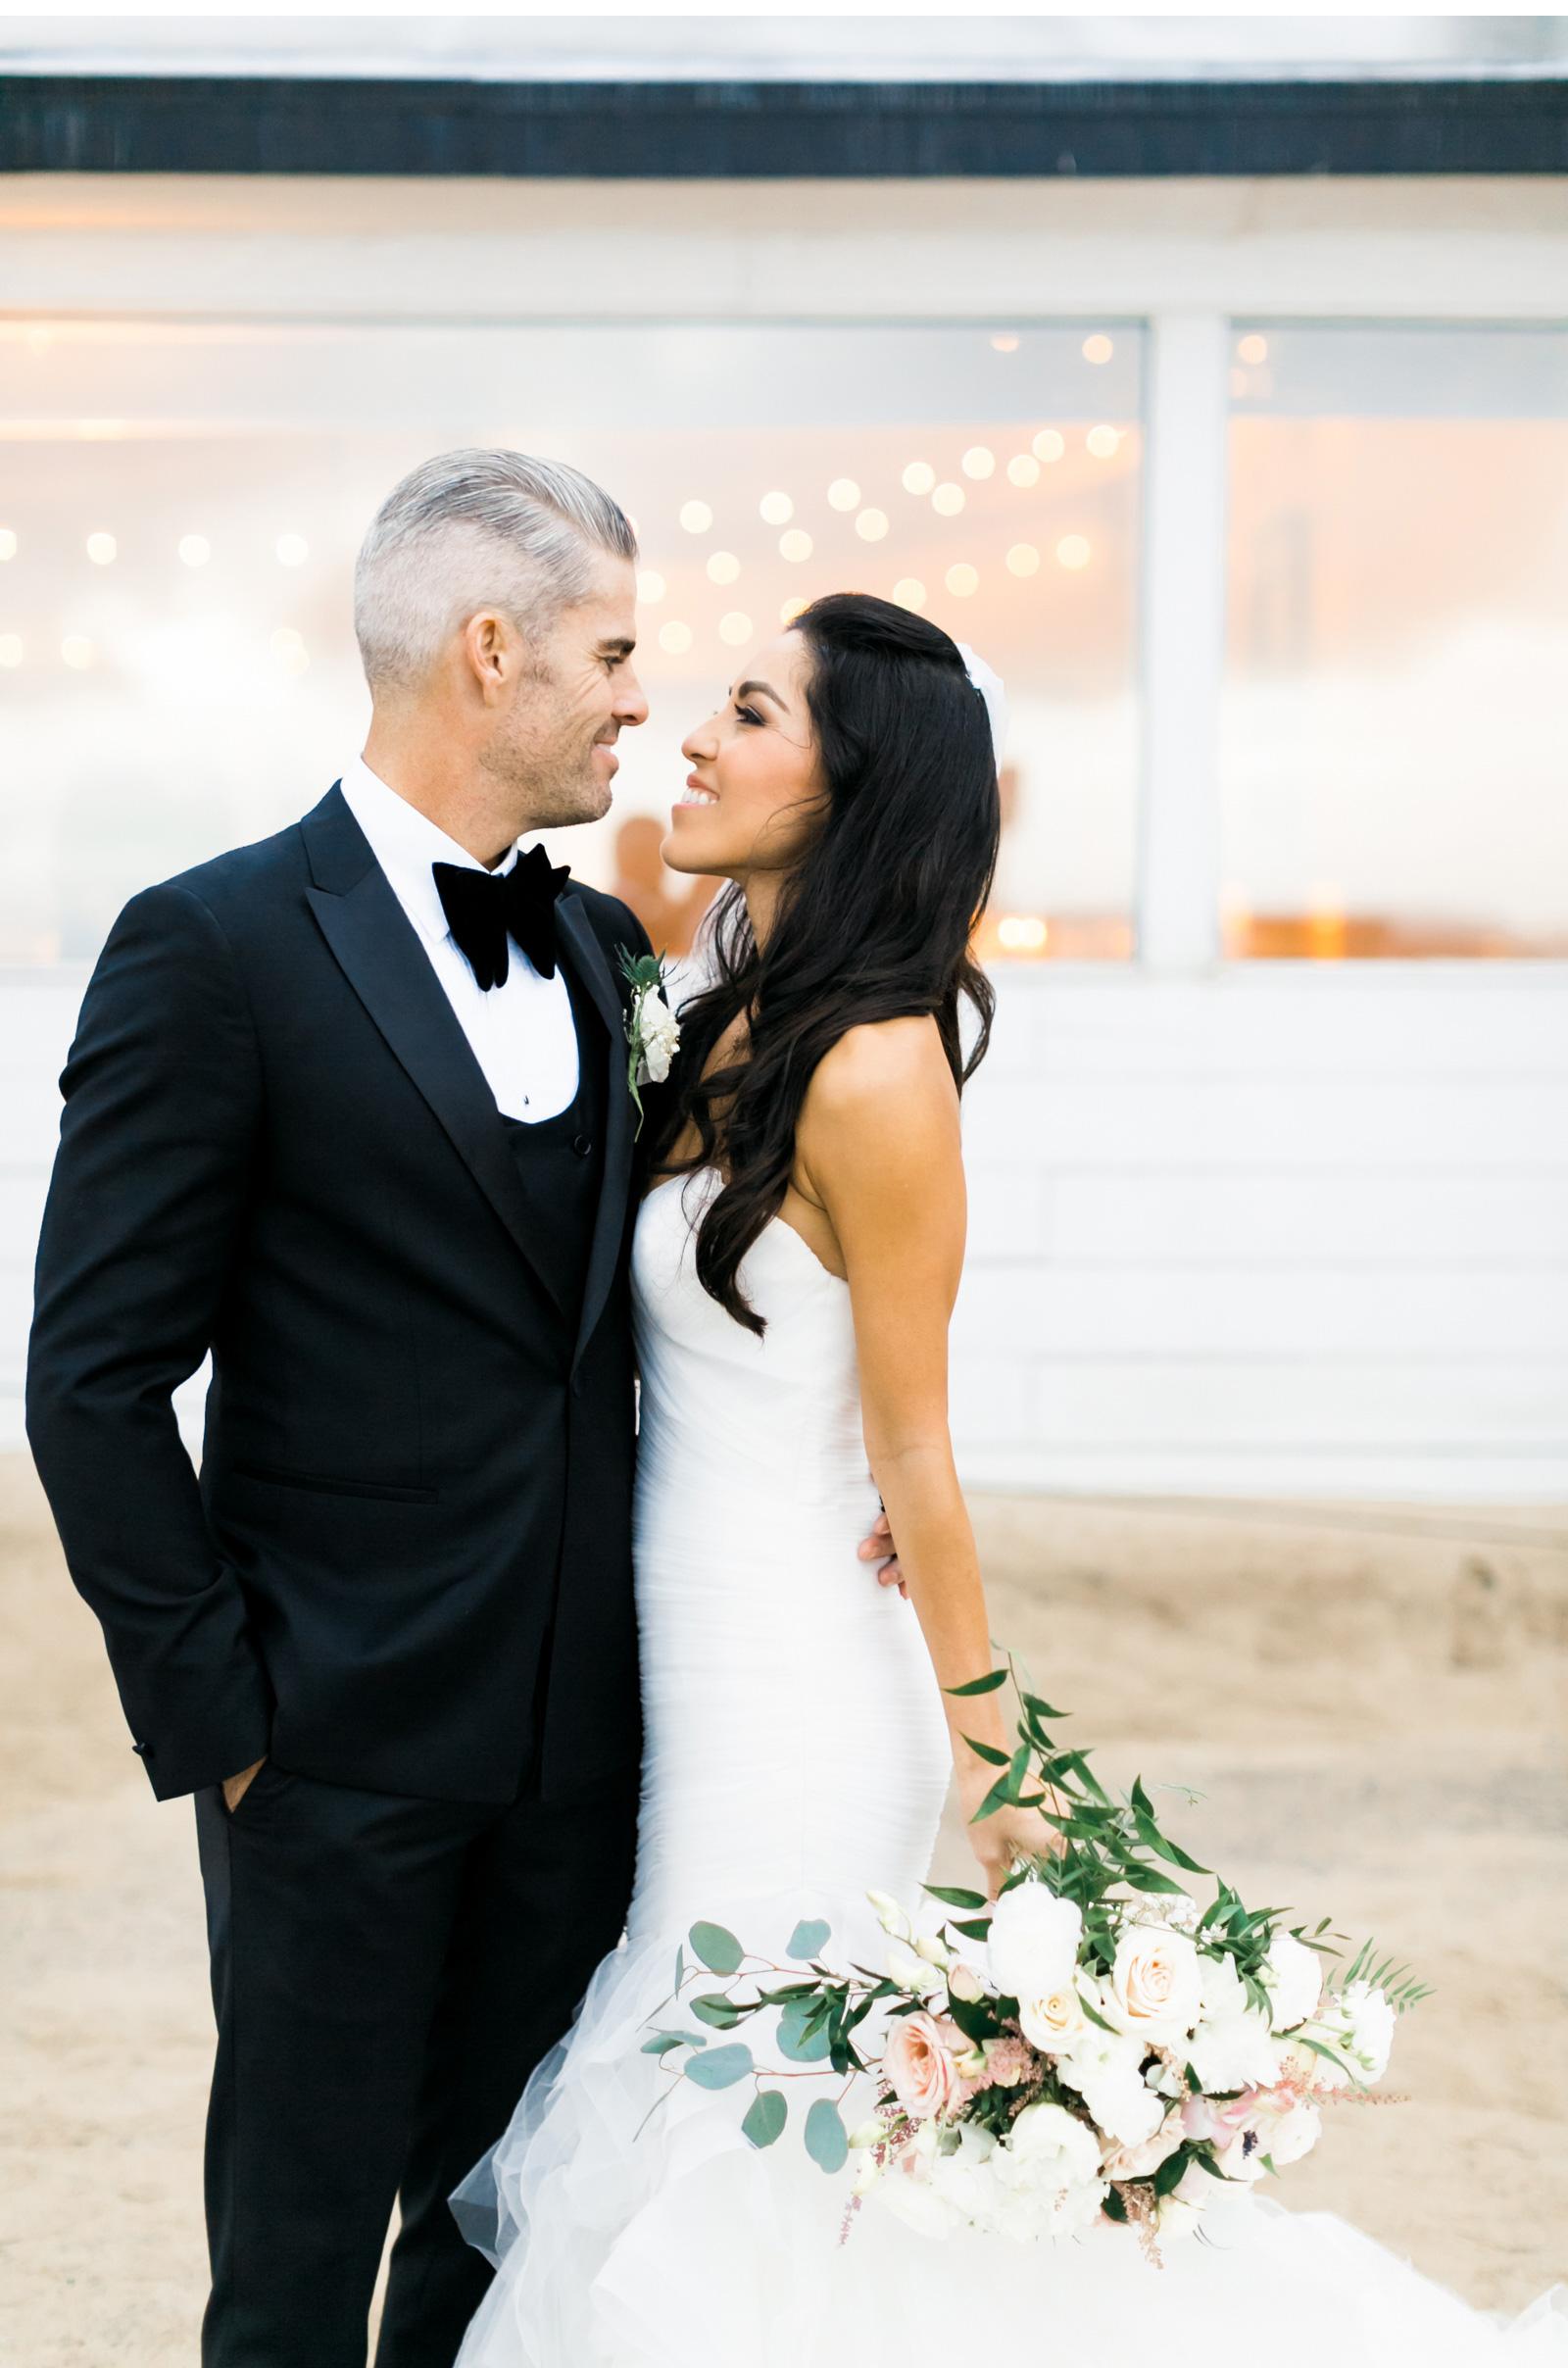 Style-Me-Pretty-Malibu-Beach-CA-Wedding-Natalie-Schutt-Photography_07.jpg